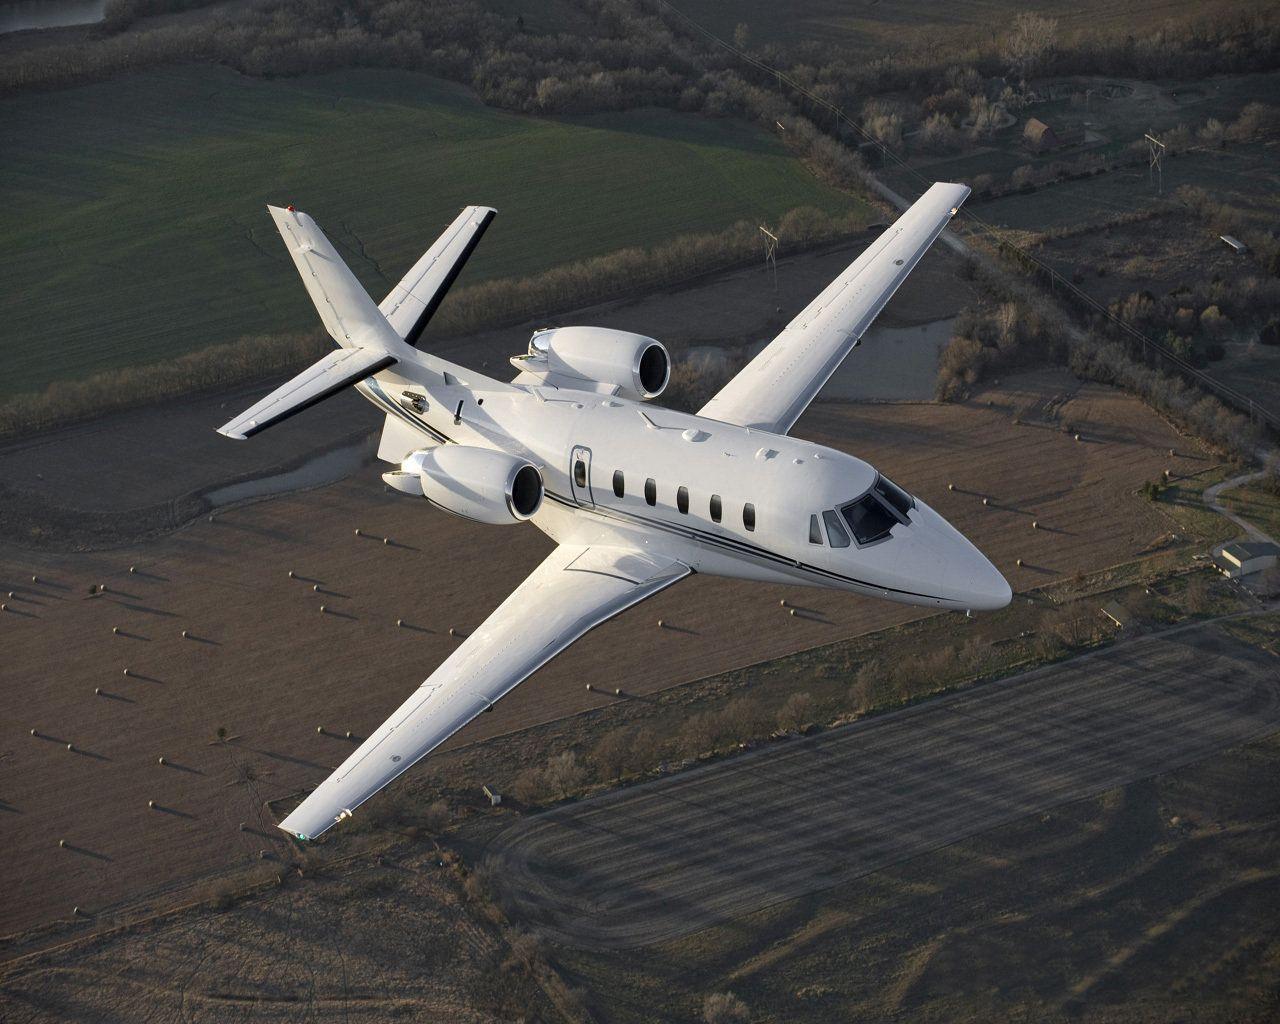 Success Citaten Xl : Croatia jet charter helicopter conte adriatic